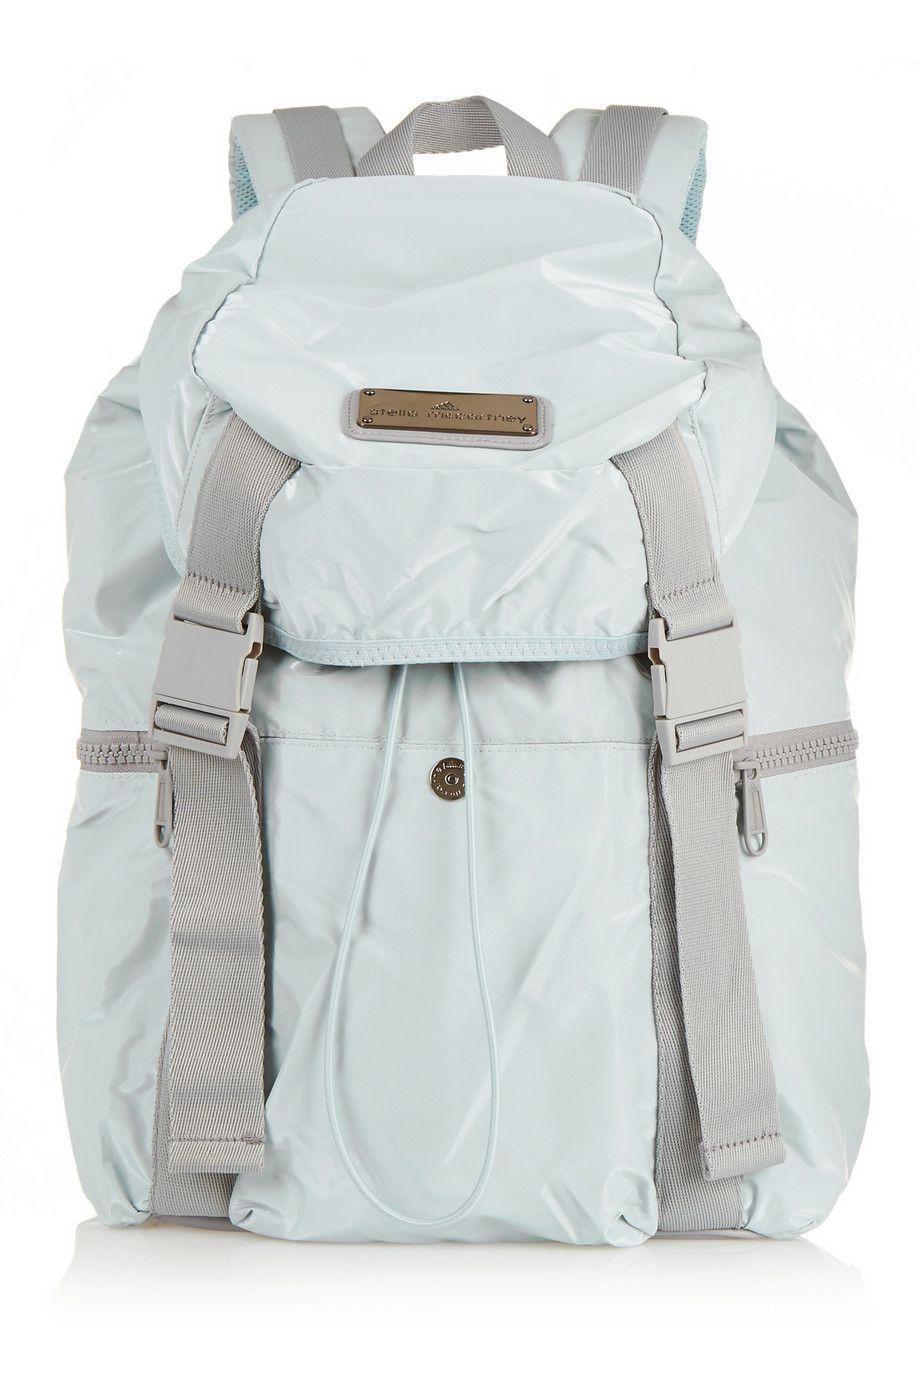 Shell Net Adidas MccartneyWeekender Stella Porter Backpack By A 5j34RAL